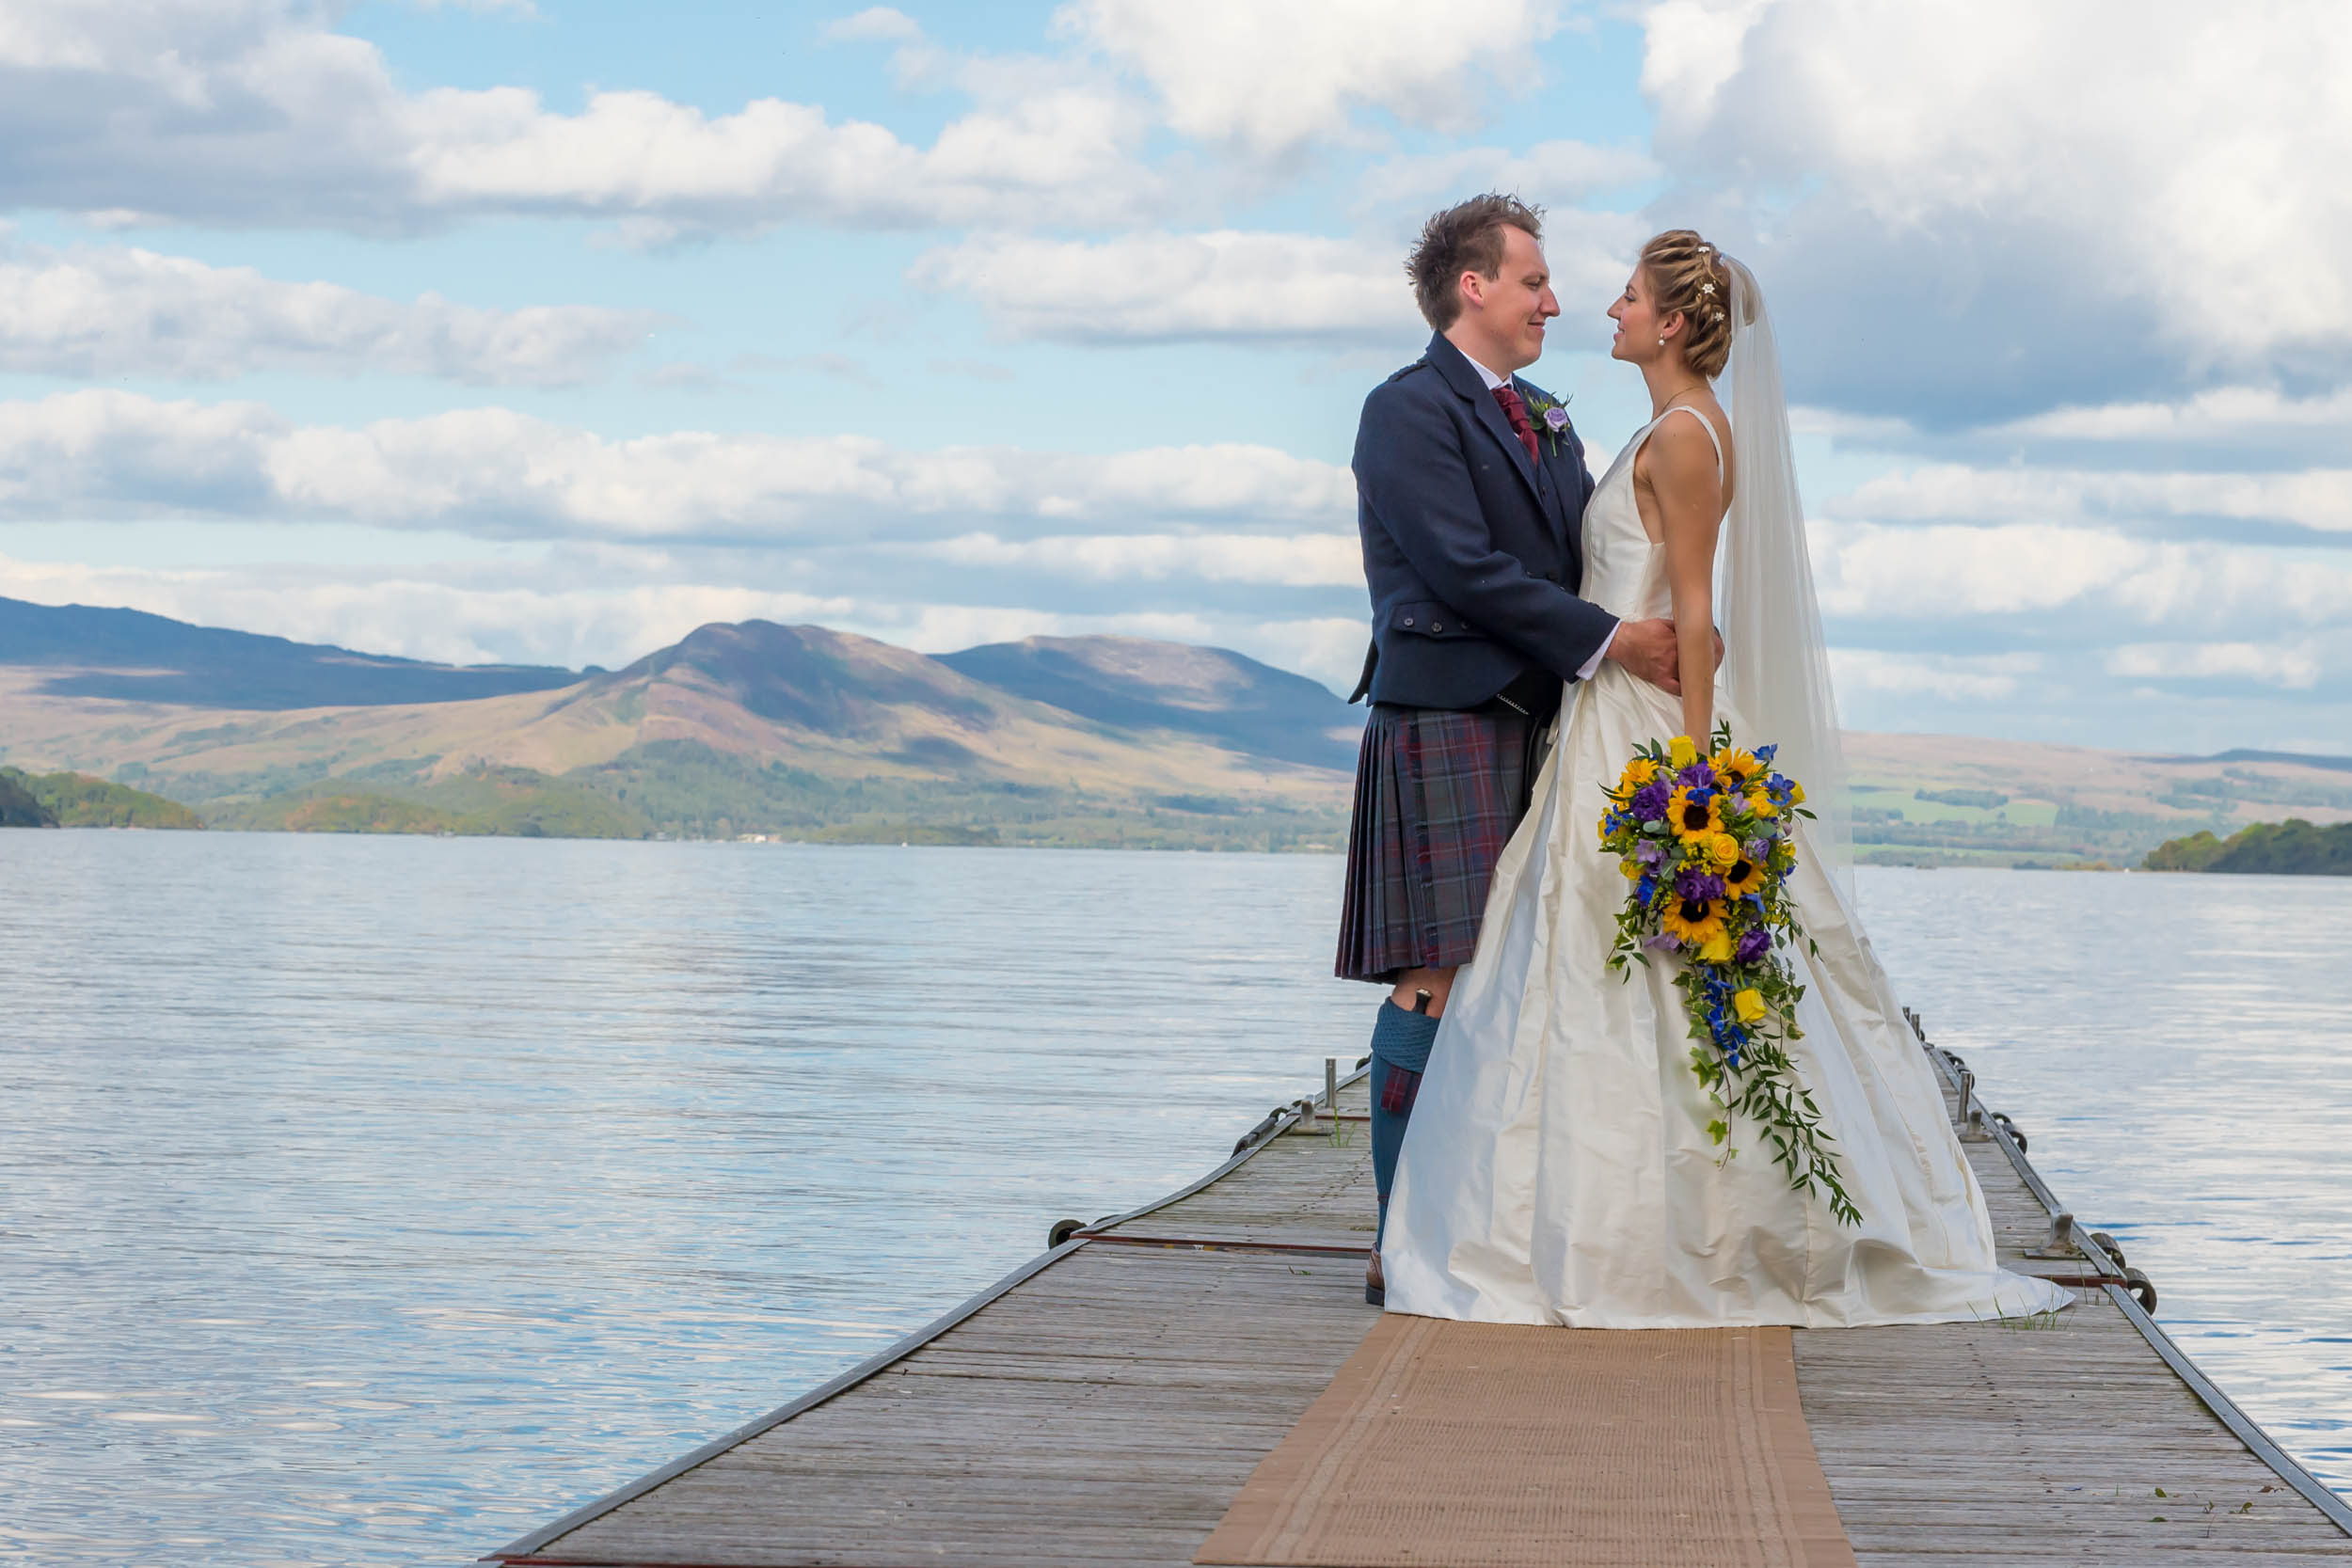 Paul-Saunders-Wedding-Photography-6523.jpg